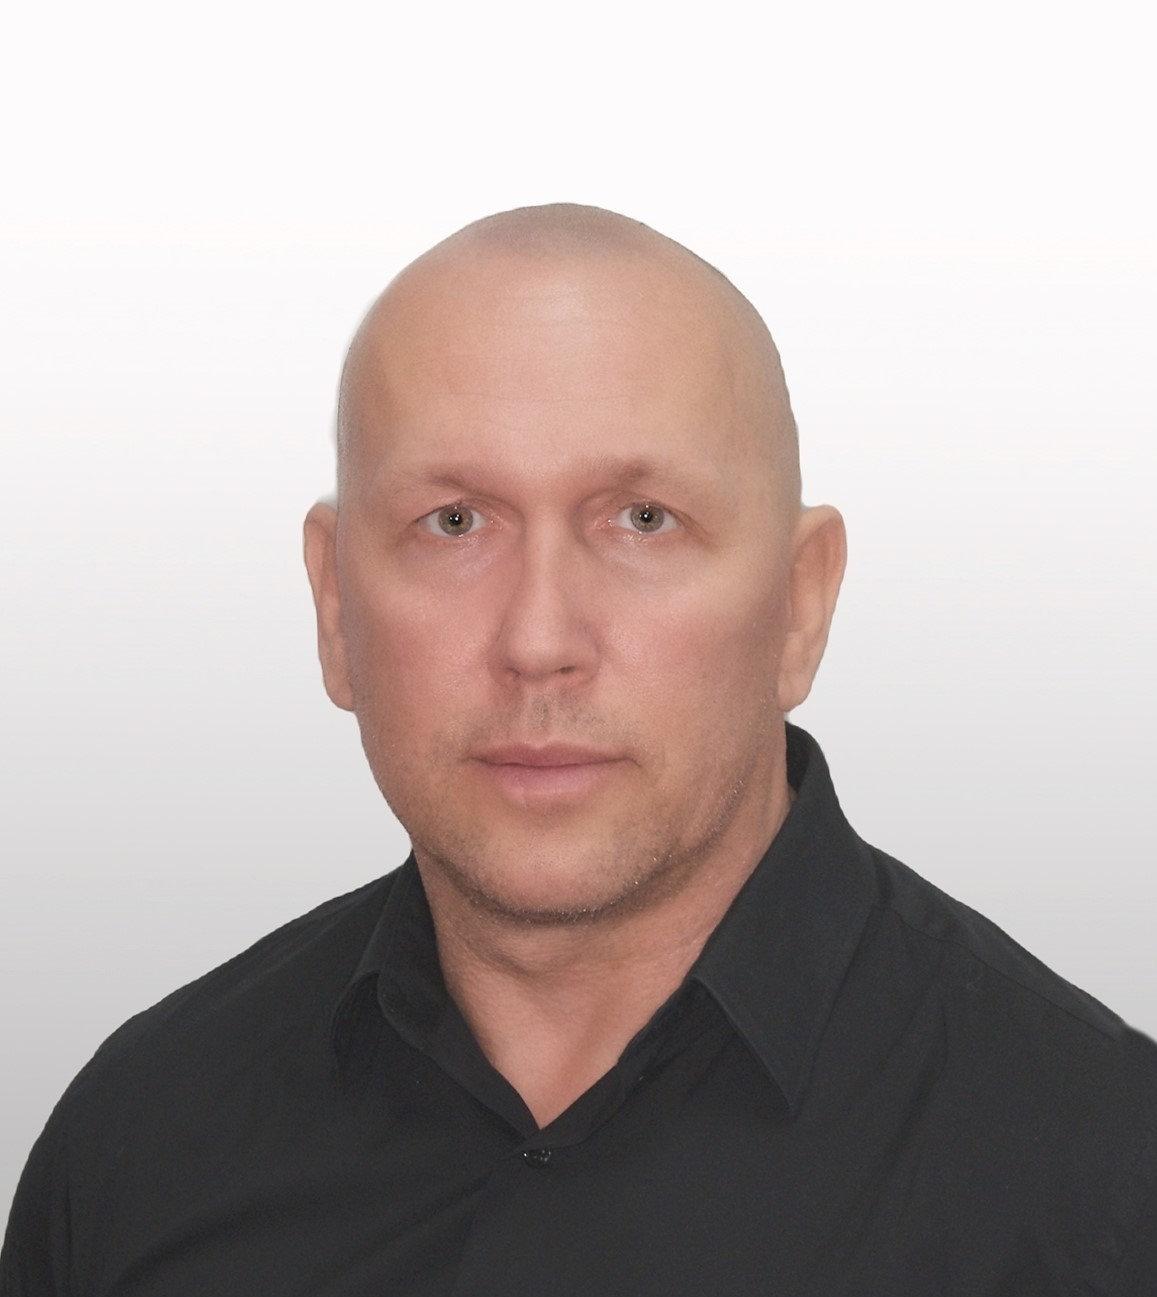 Konsultacja mgr Marek Wlaźlak